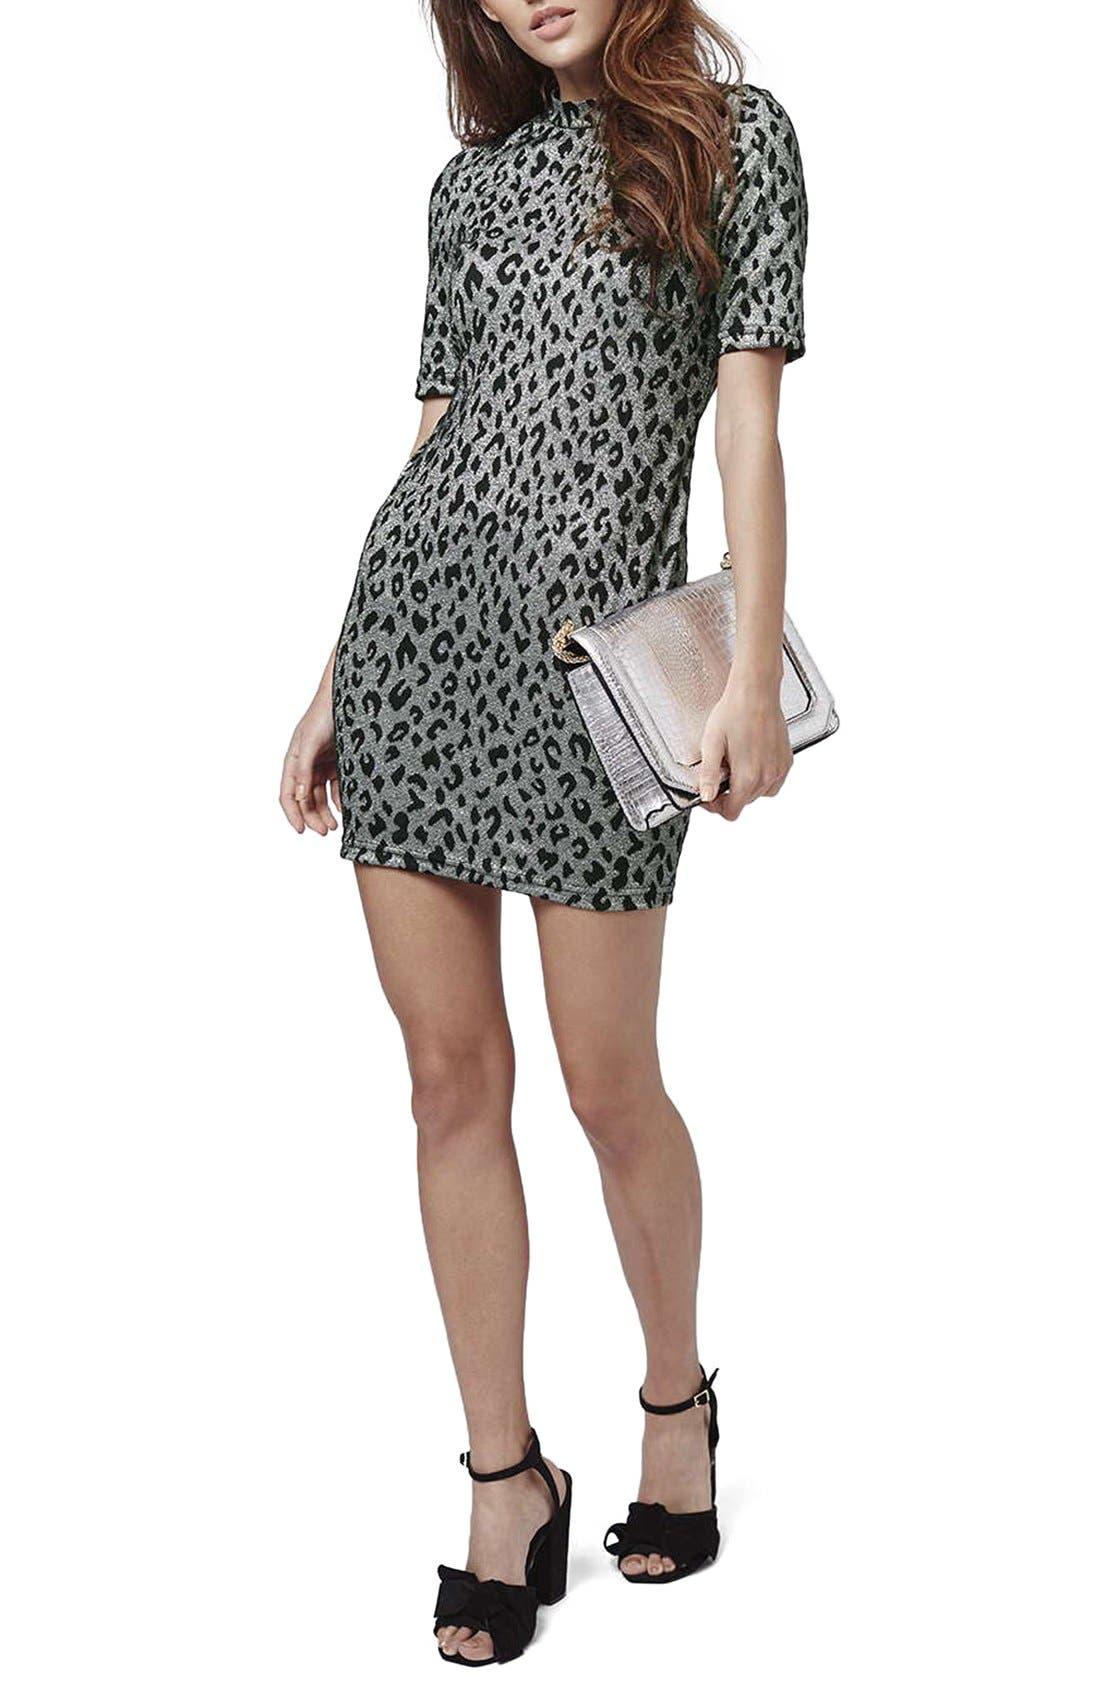 Main Image - Topshop Jacquard Leopard Body-Con Dress (Regular & Petite)